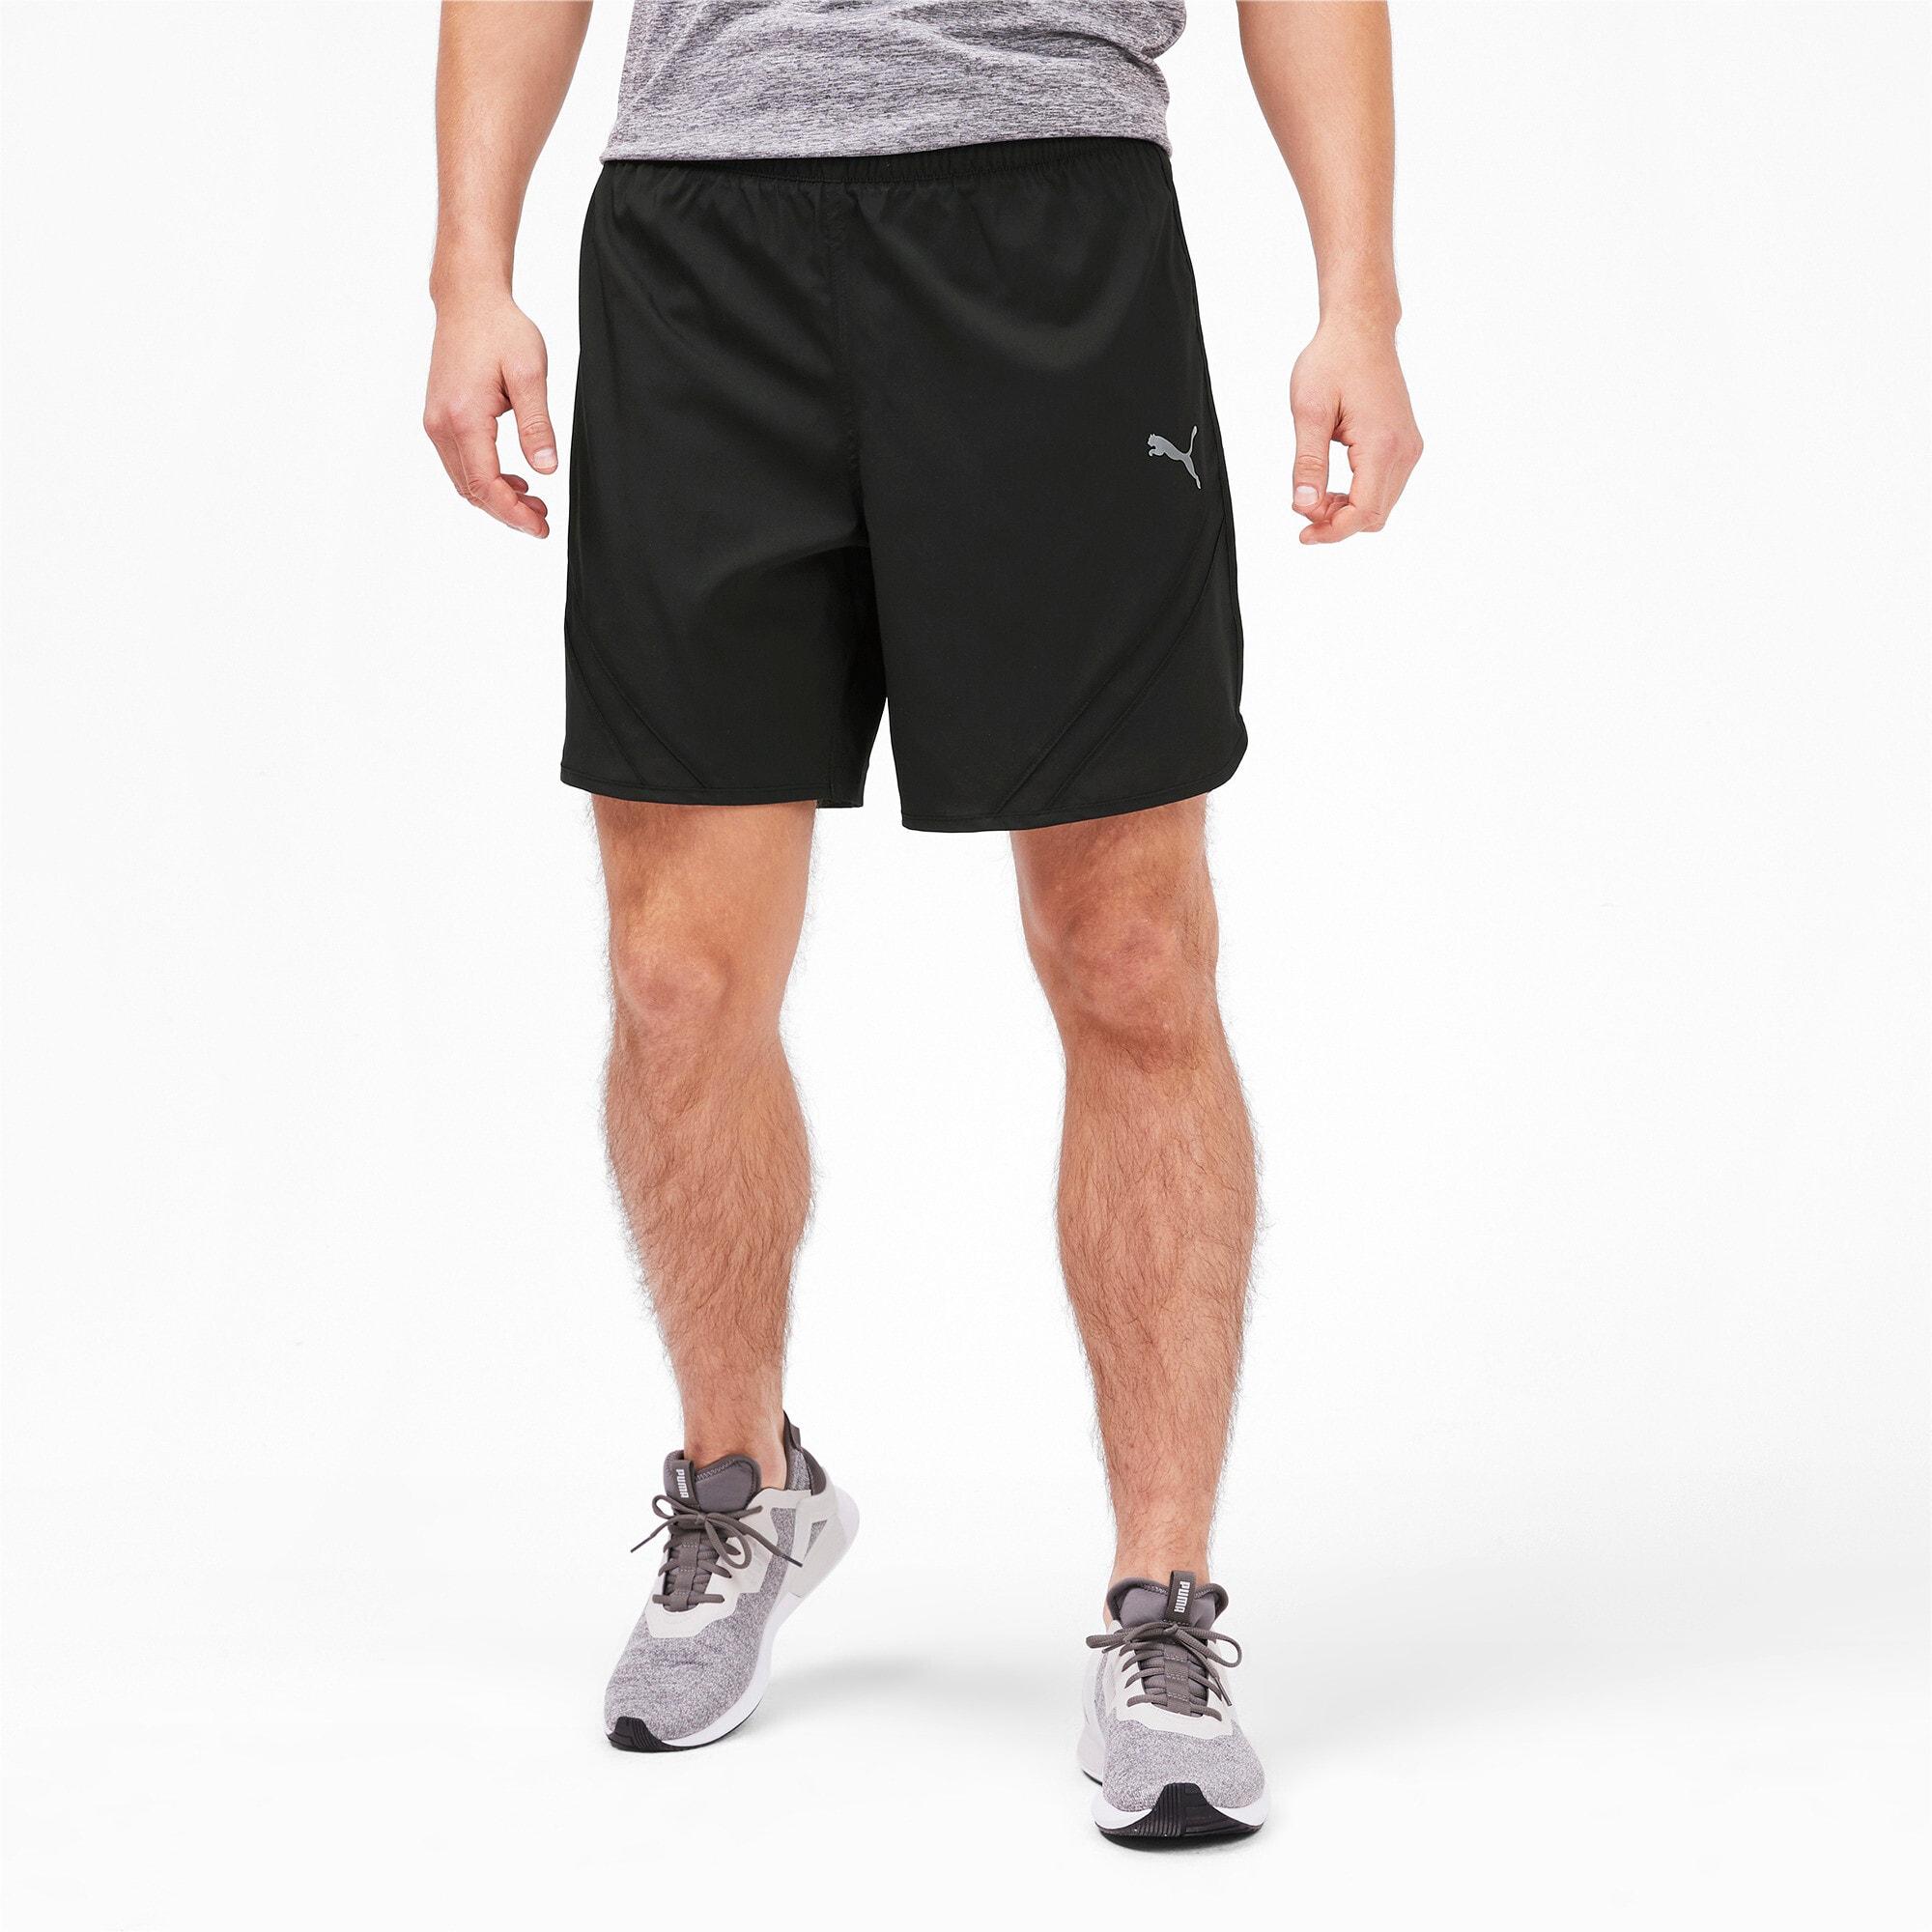 Thumbnail 1 of Last Lap Woven 2 in 1 Men's Running Shorts, Puma Black, medium